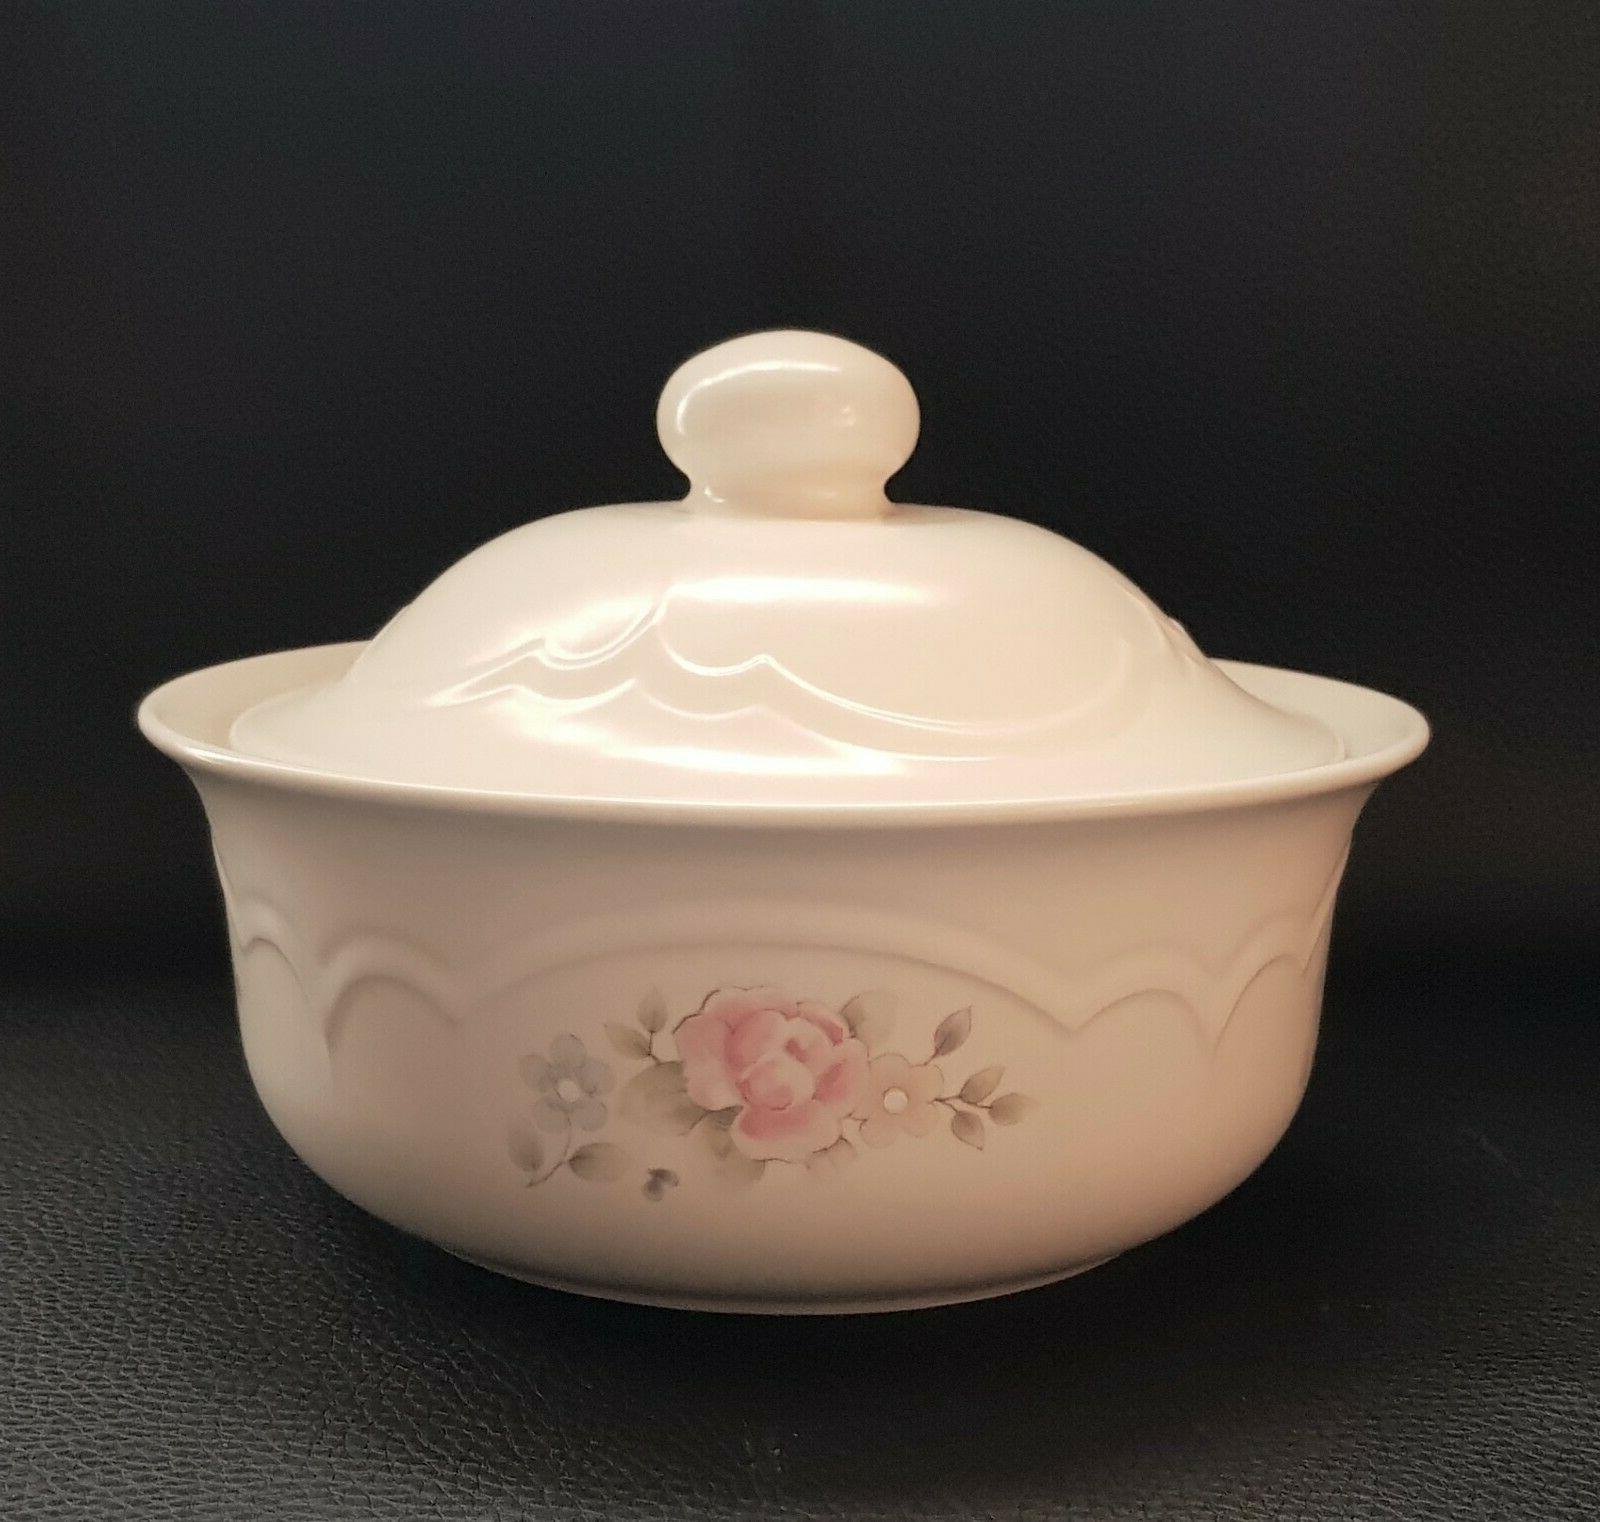 Pfaltzgraff Tea Rose Serverware Sets- Plates, Bowls, Platters, Casserole More